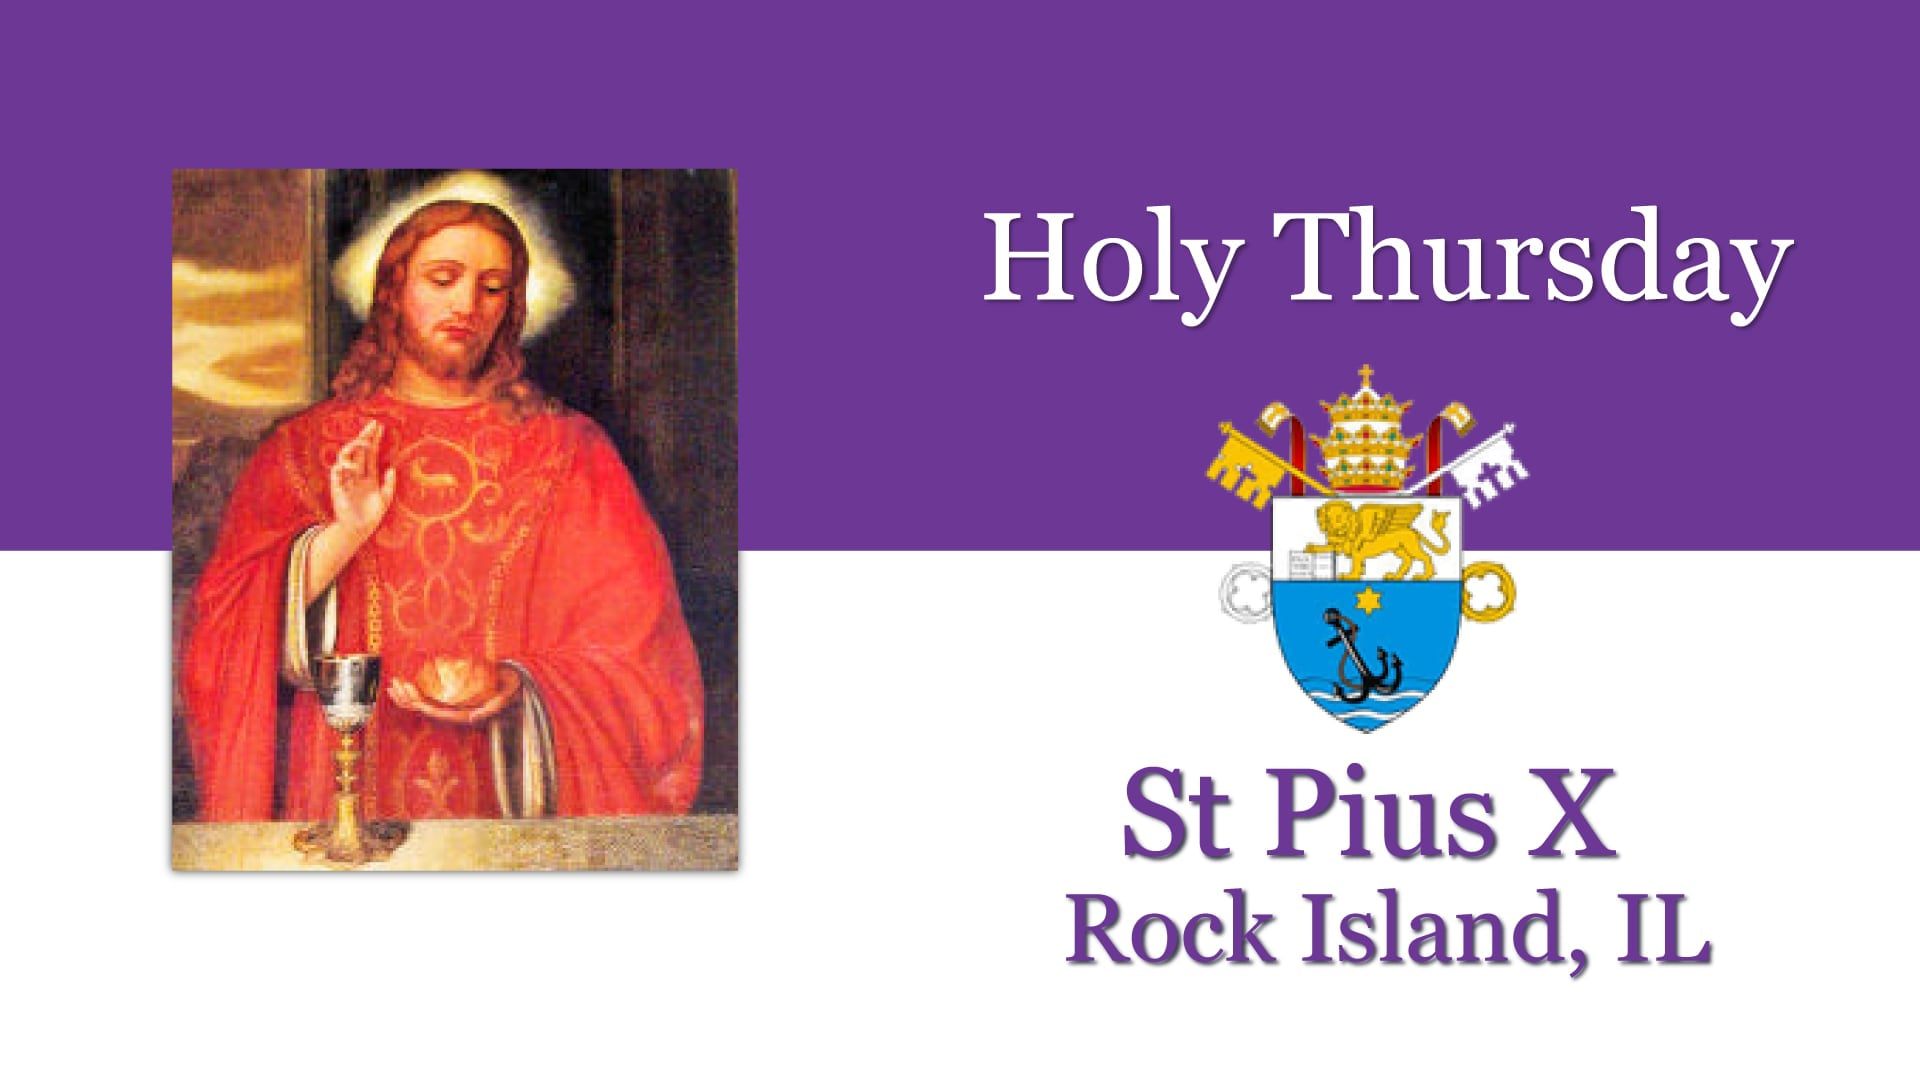 Holy Thursday, April 1st, St Pius X, Rock Island